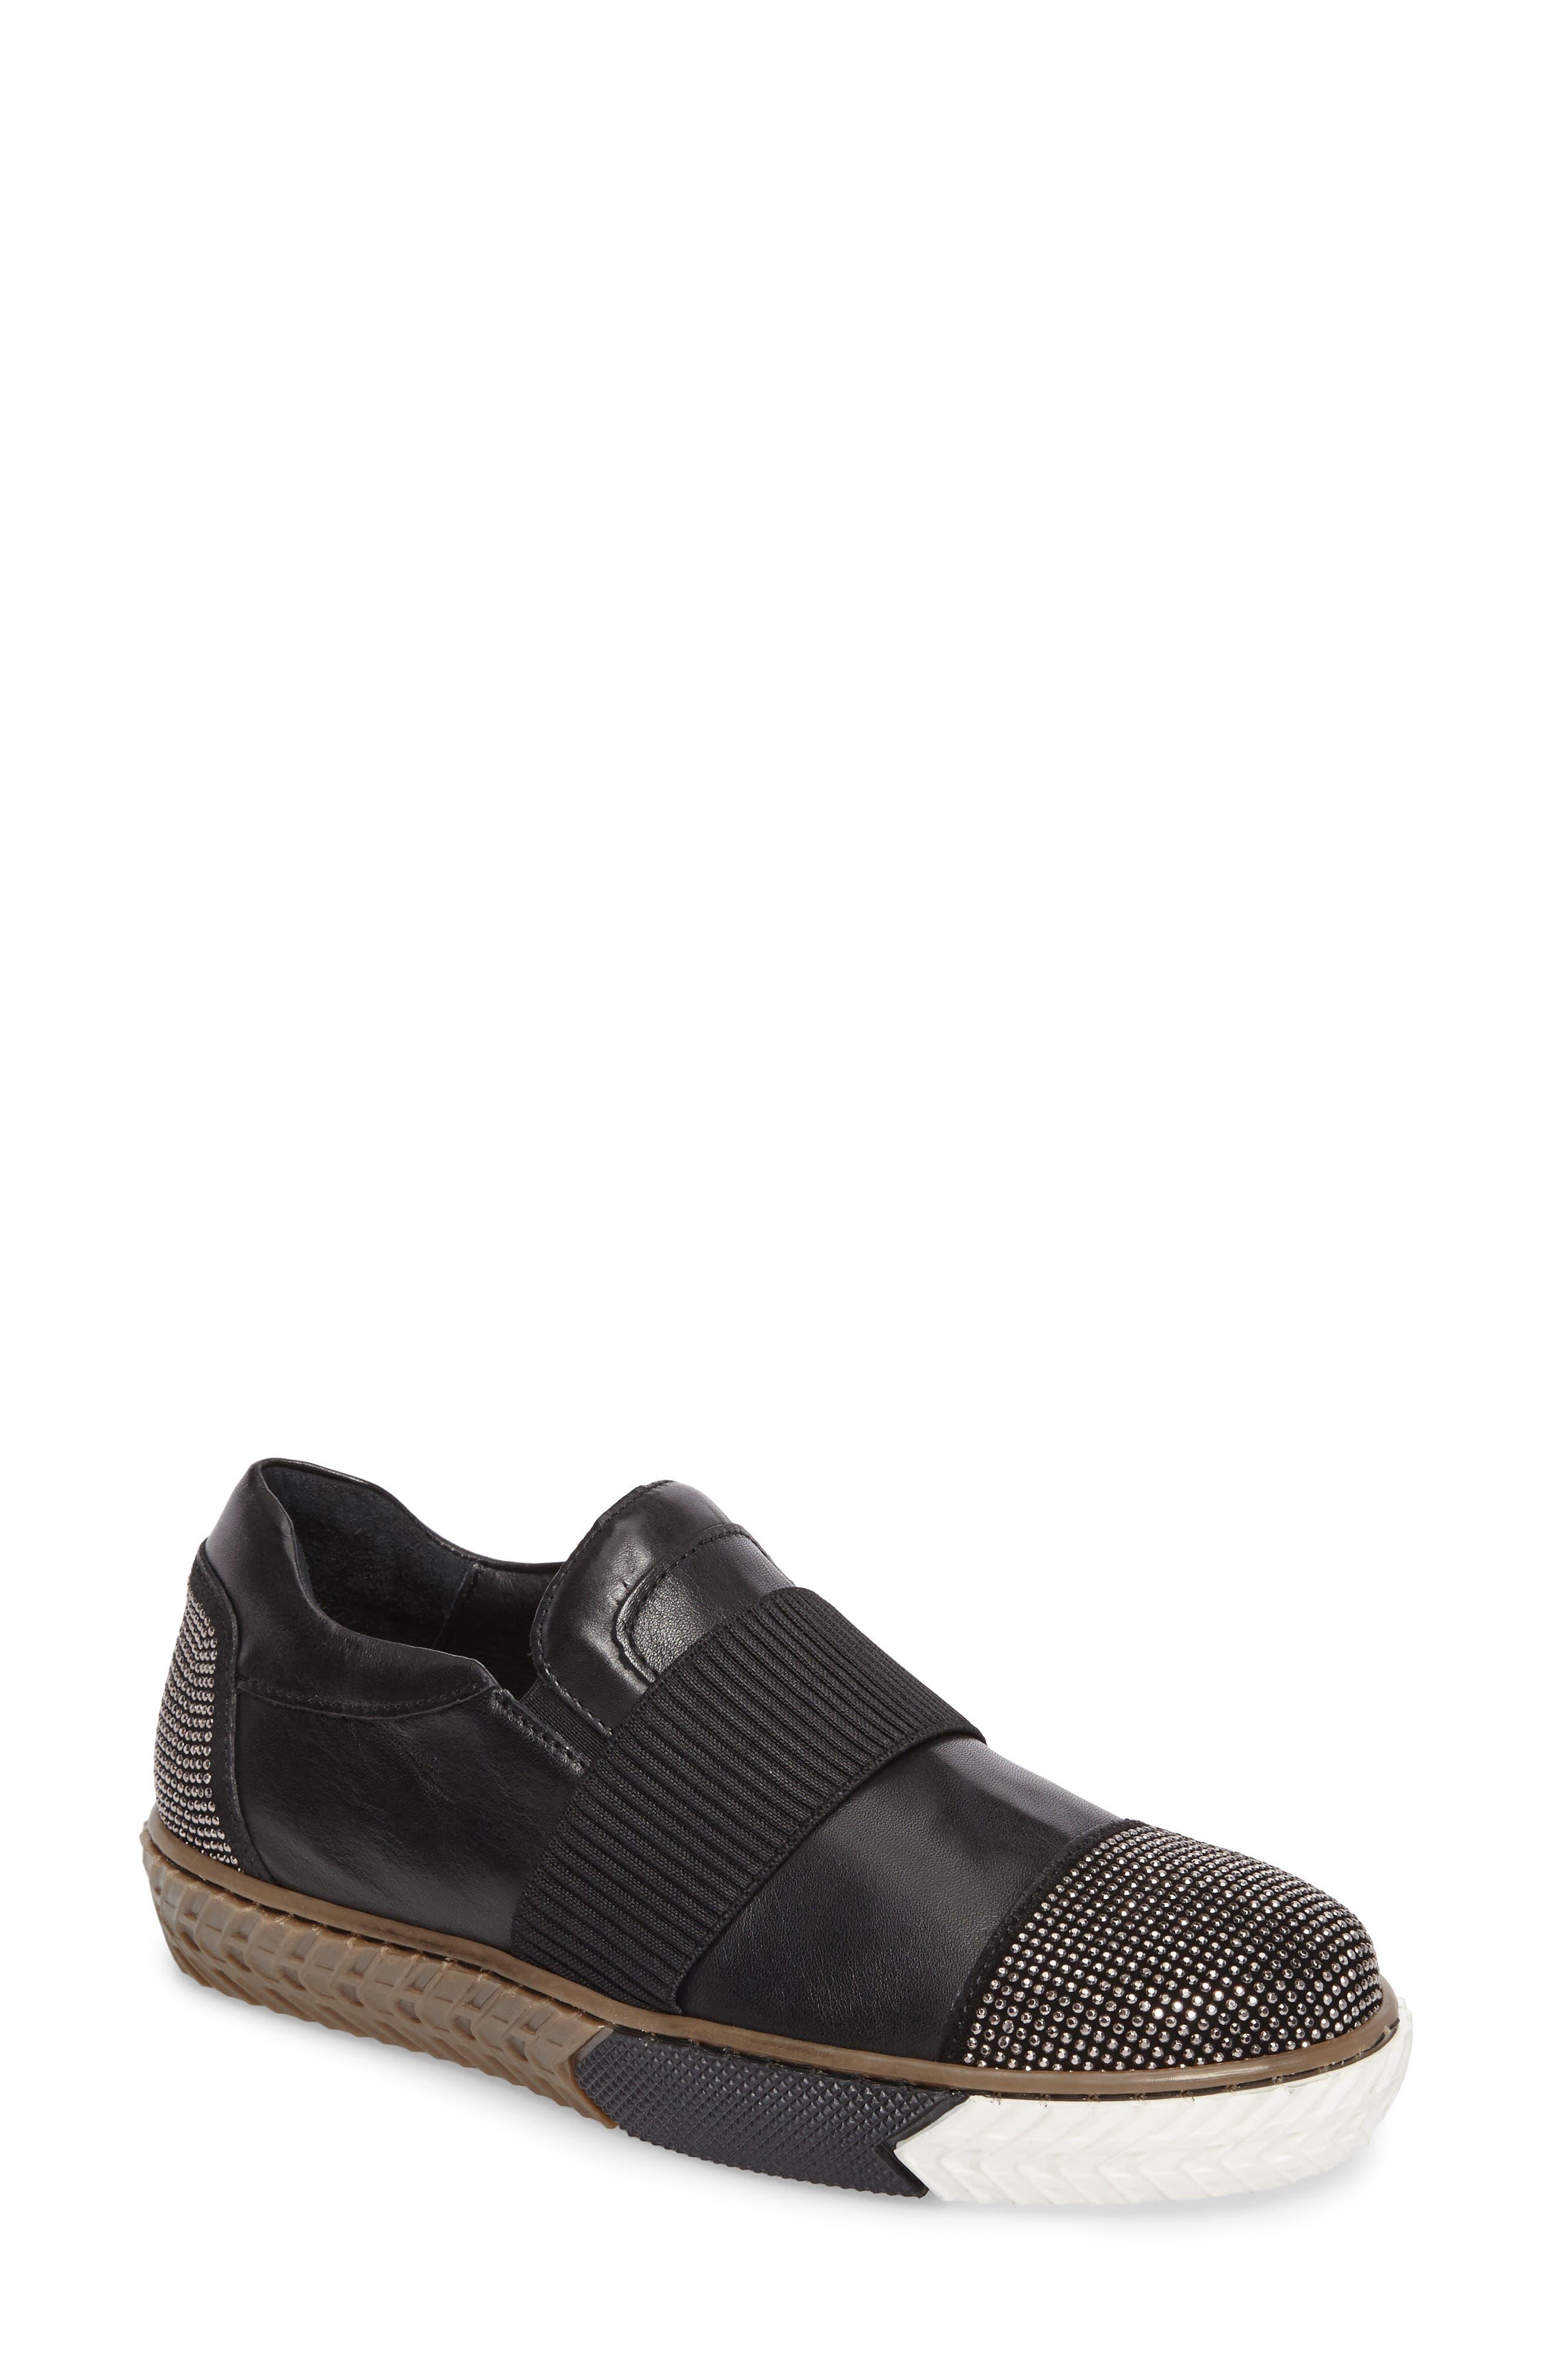 Vibe Slip-On Sneaker,                         Main,                         color,